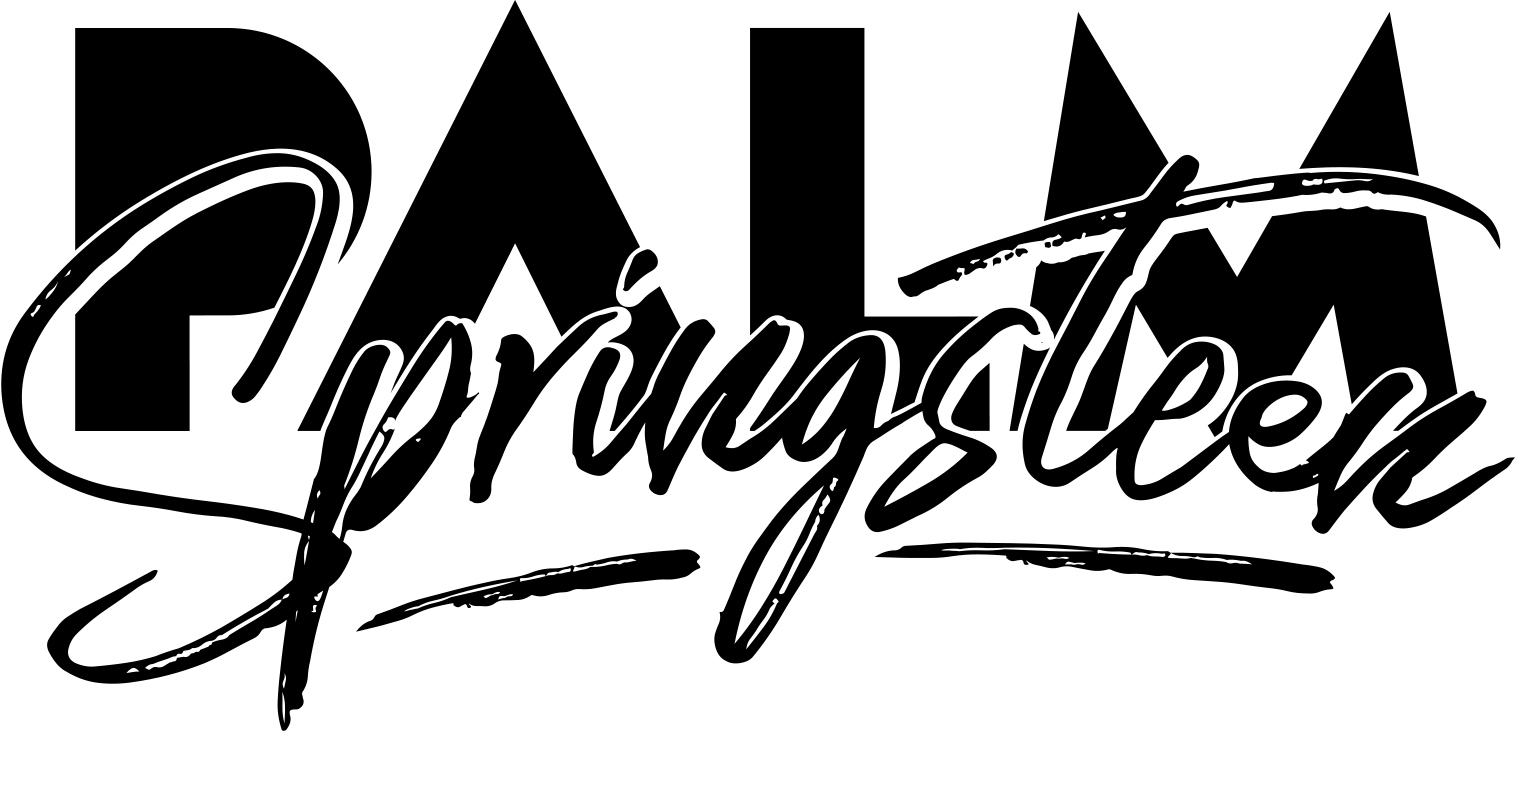 palm_springsteen_logo.jpg